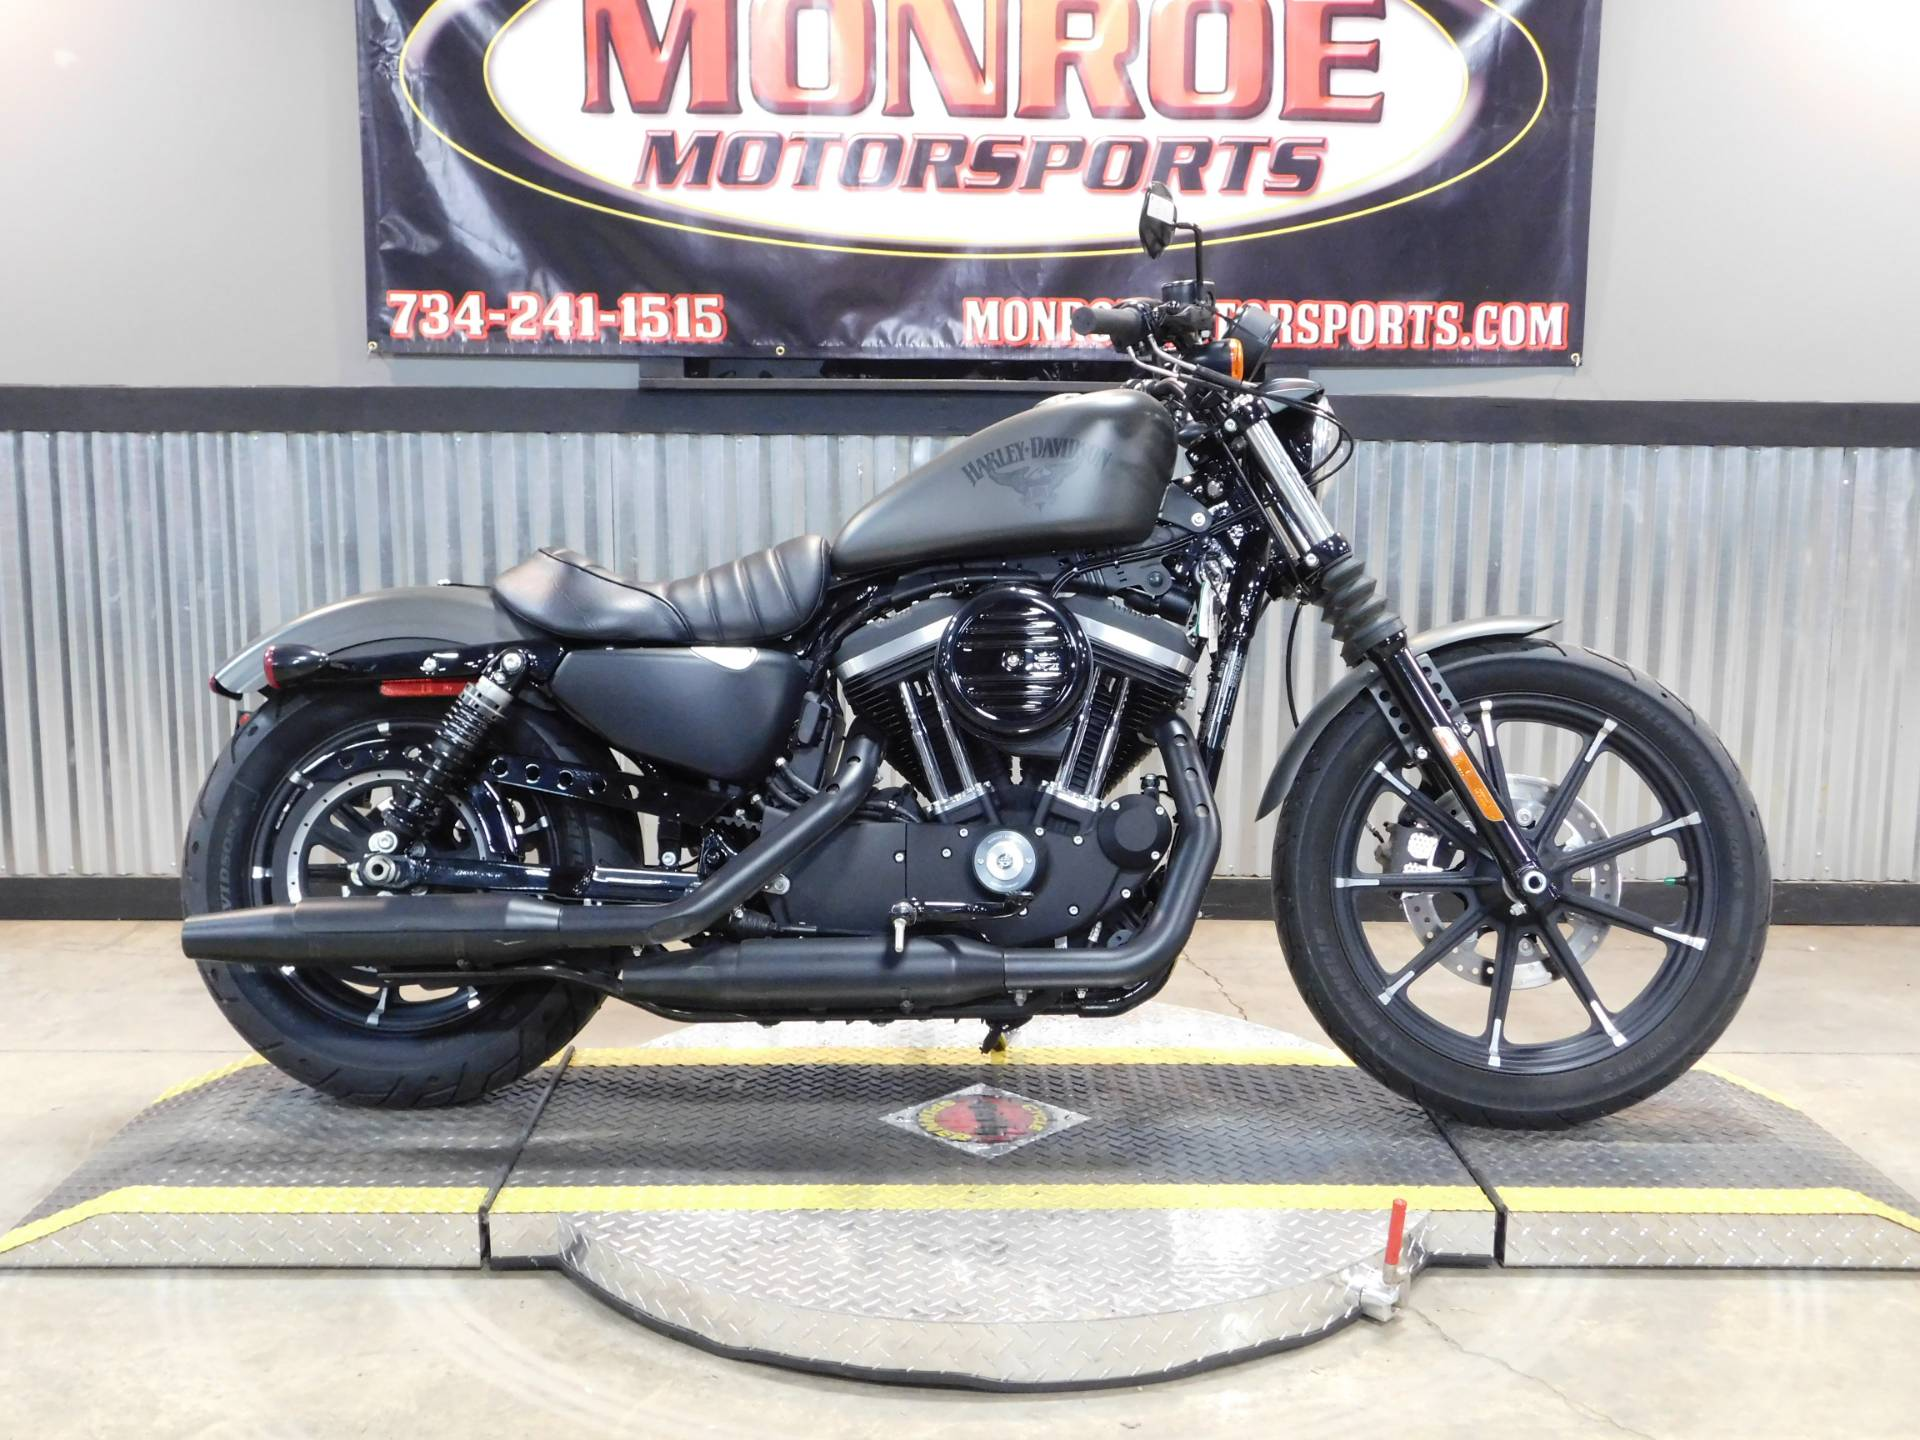 Used 2018 Harley Davidson Iron 883 Motorcycles In Monroe Mi